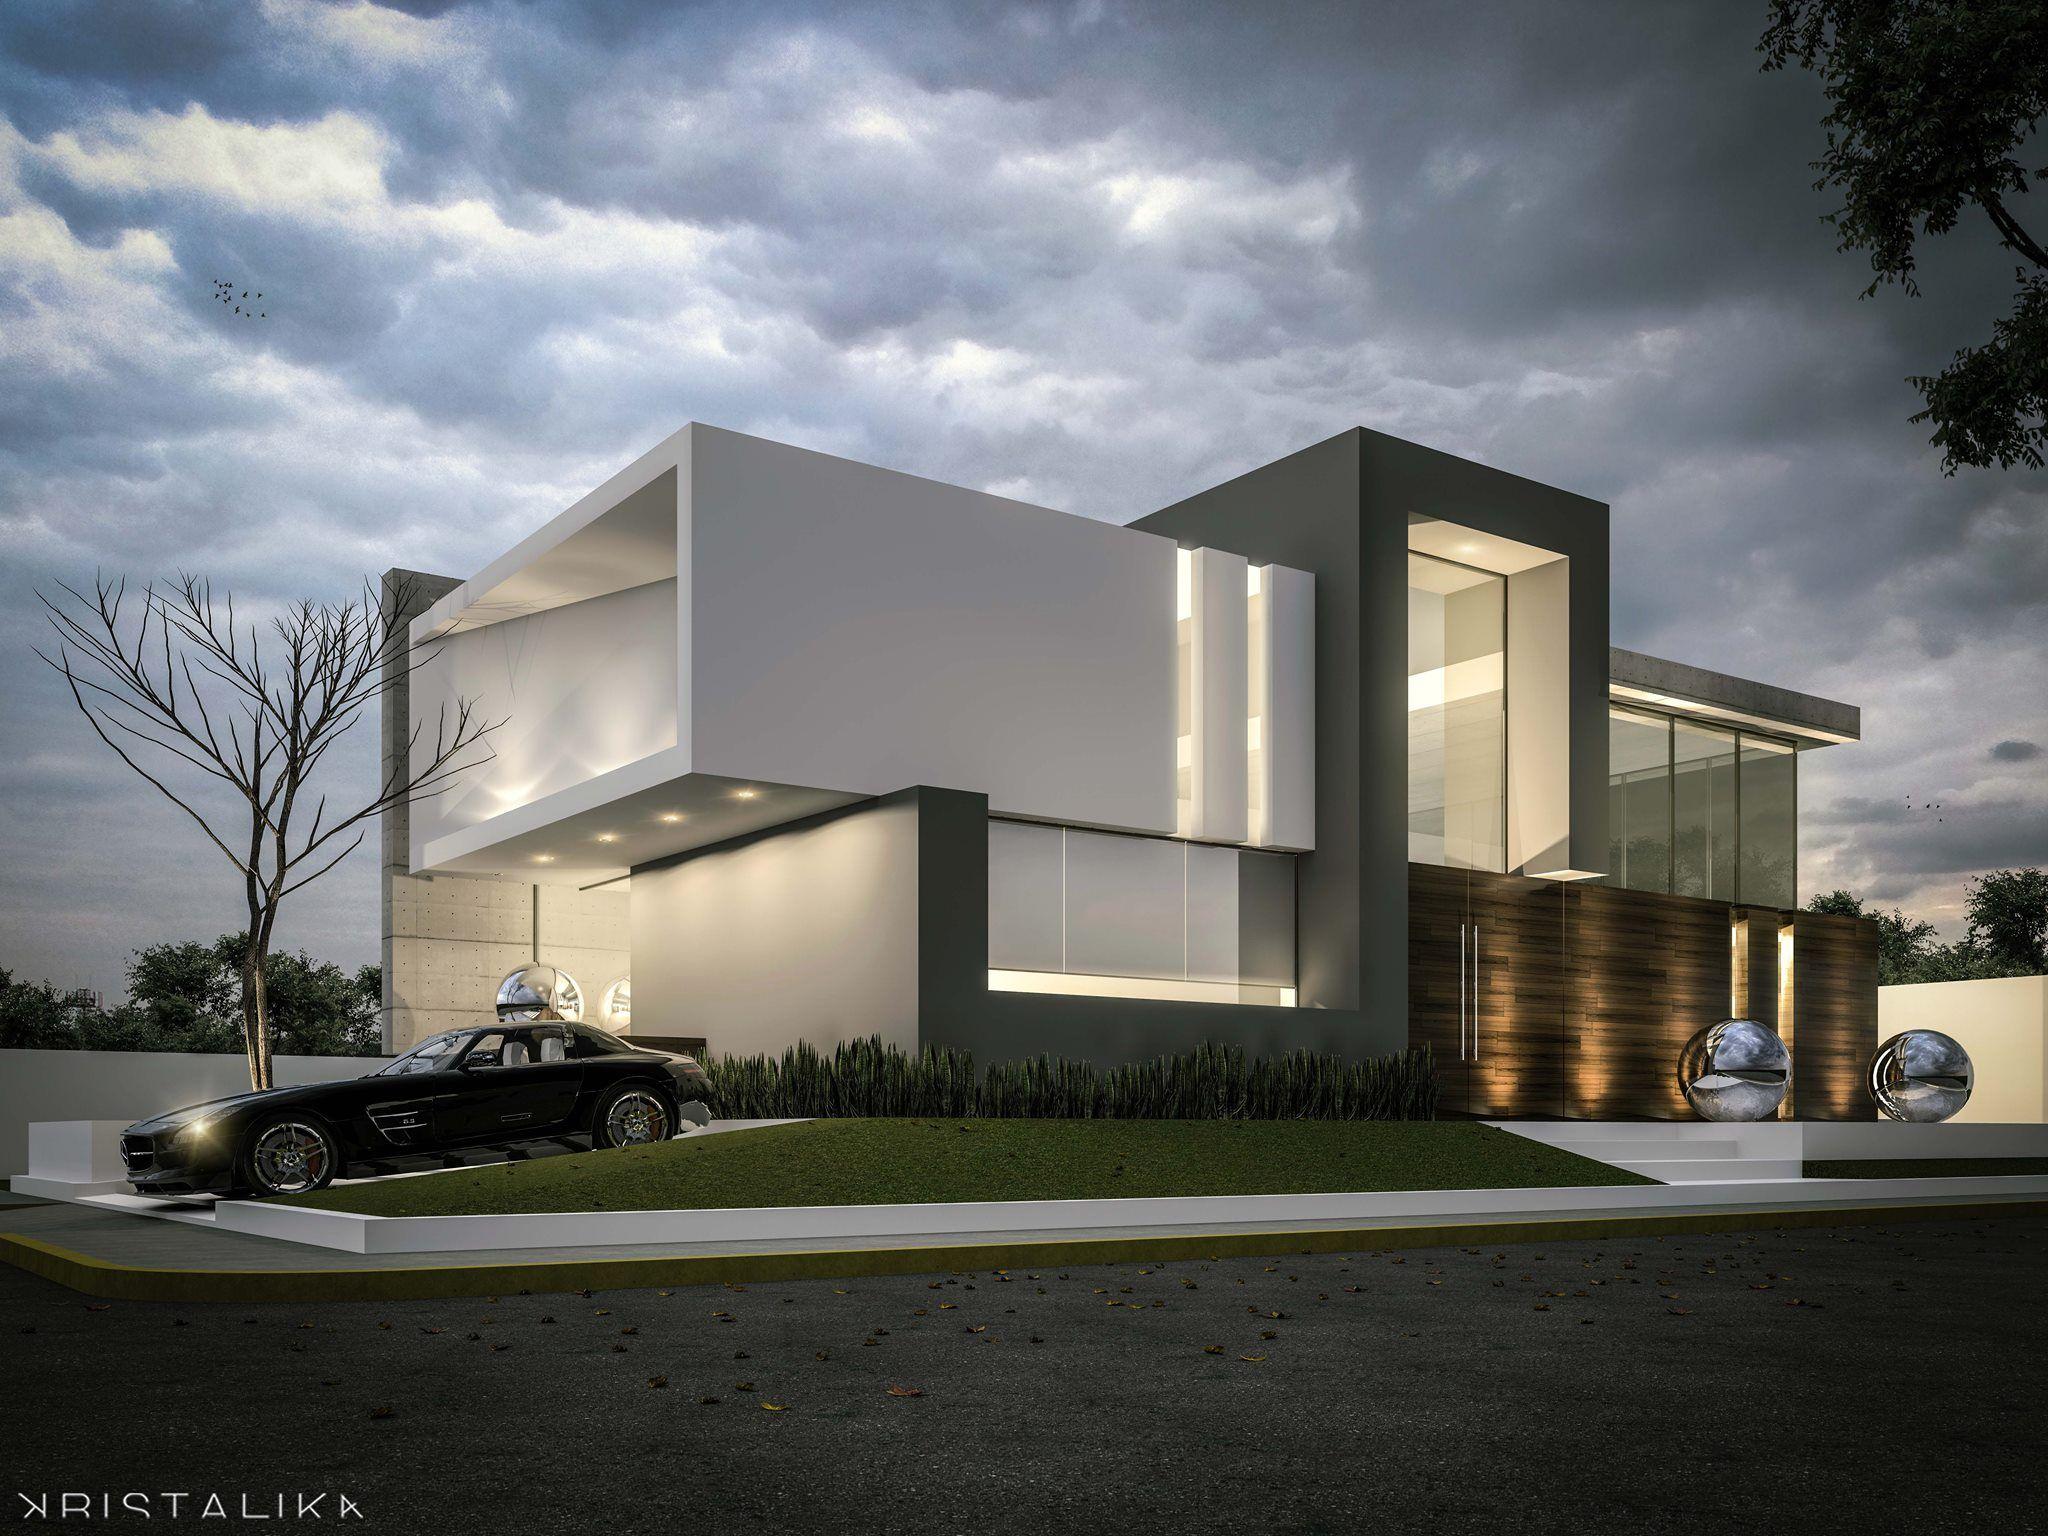 PUNTO SUR HOUSE Modern architecture, Architecture design